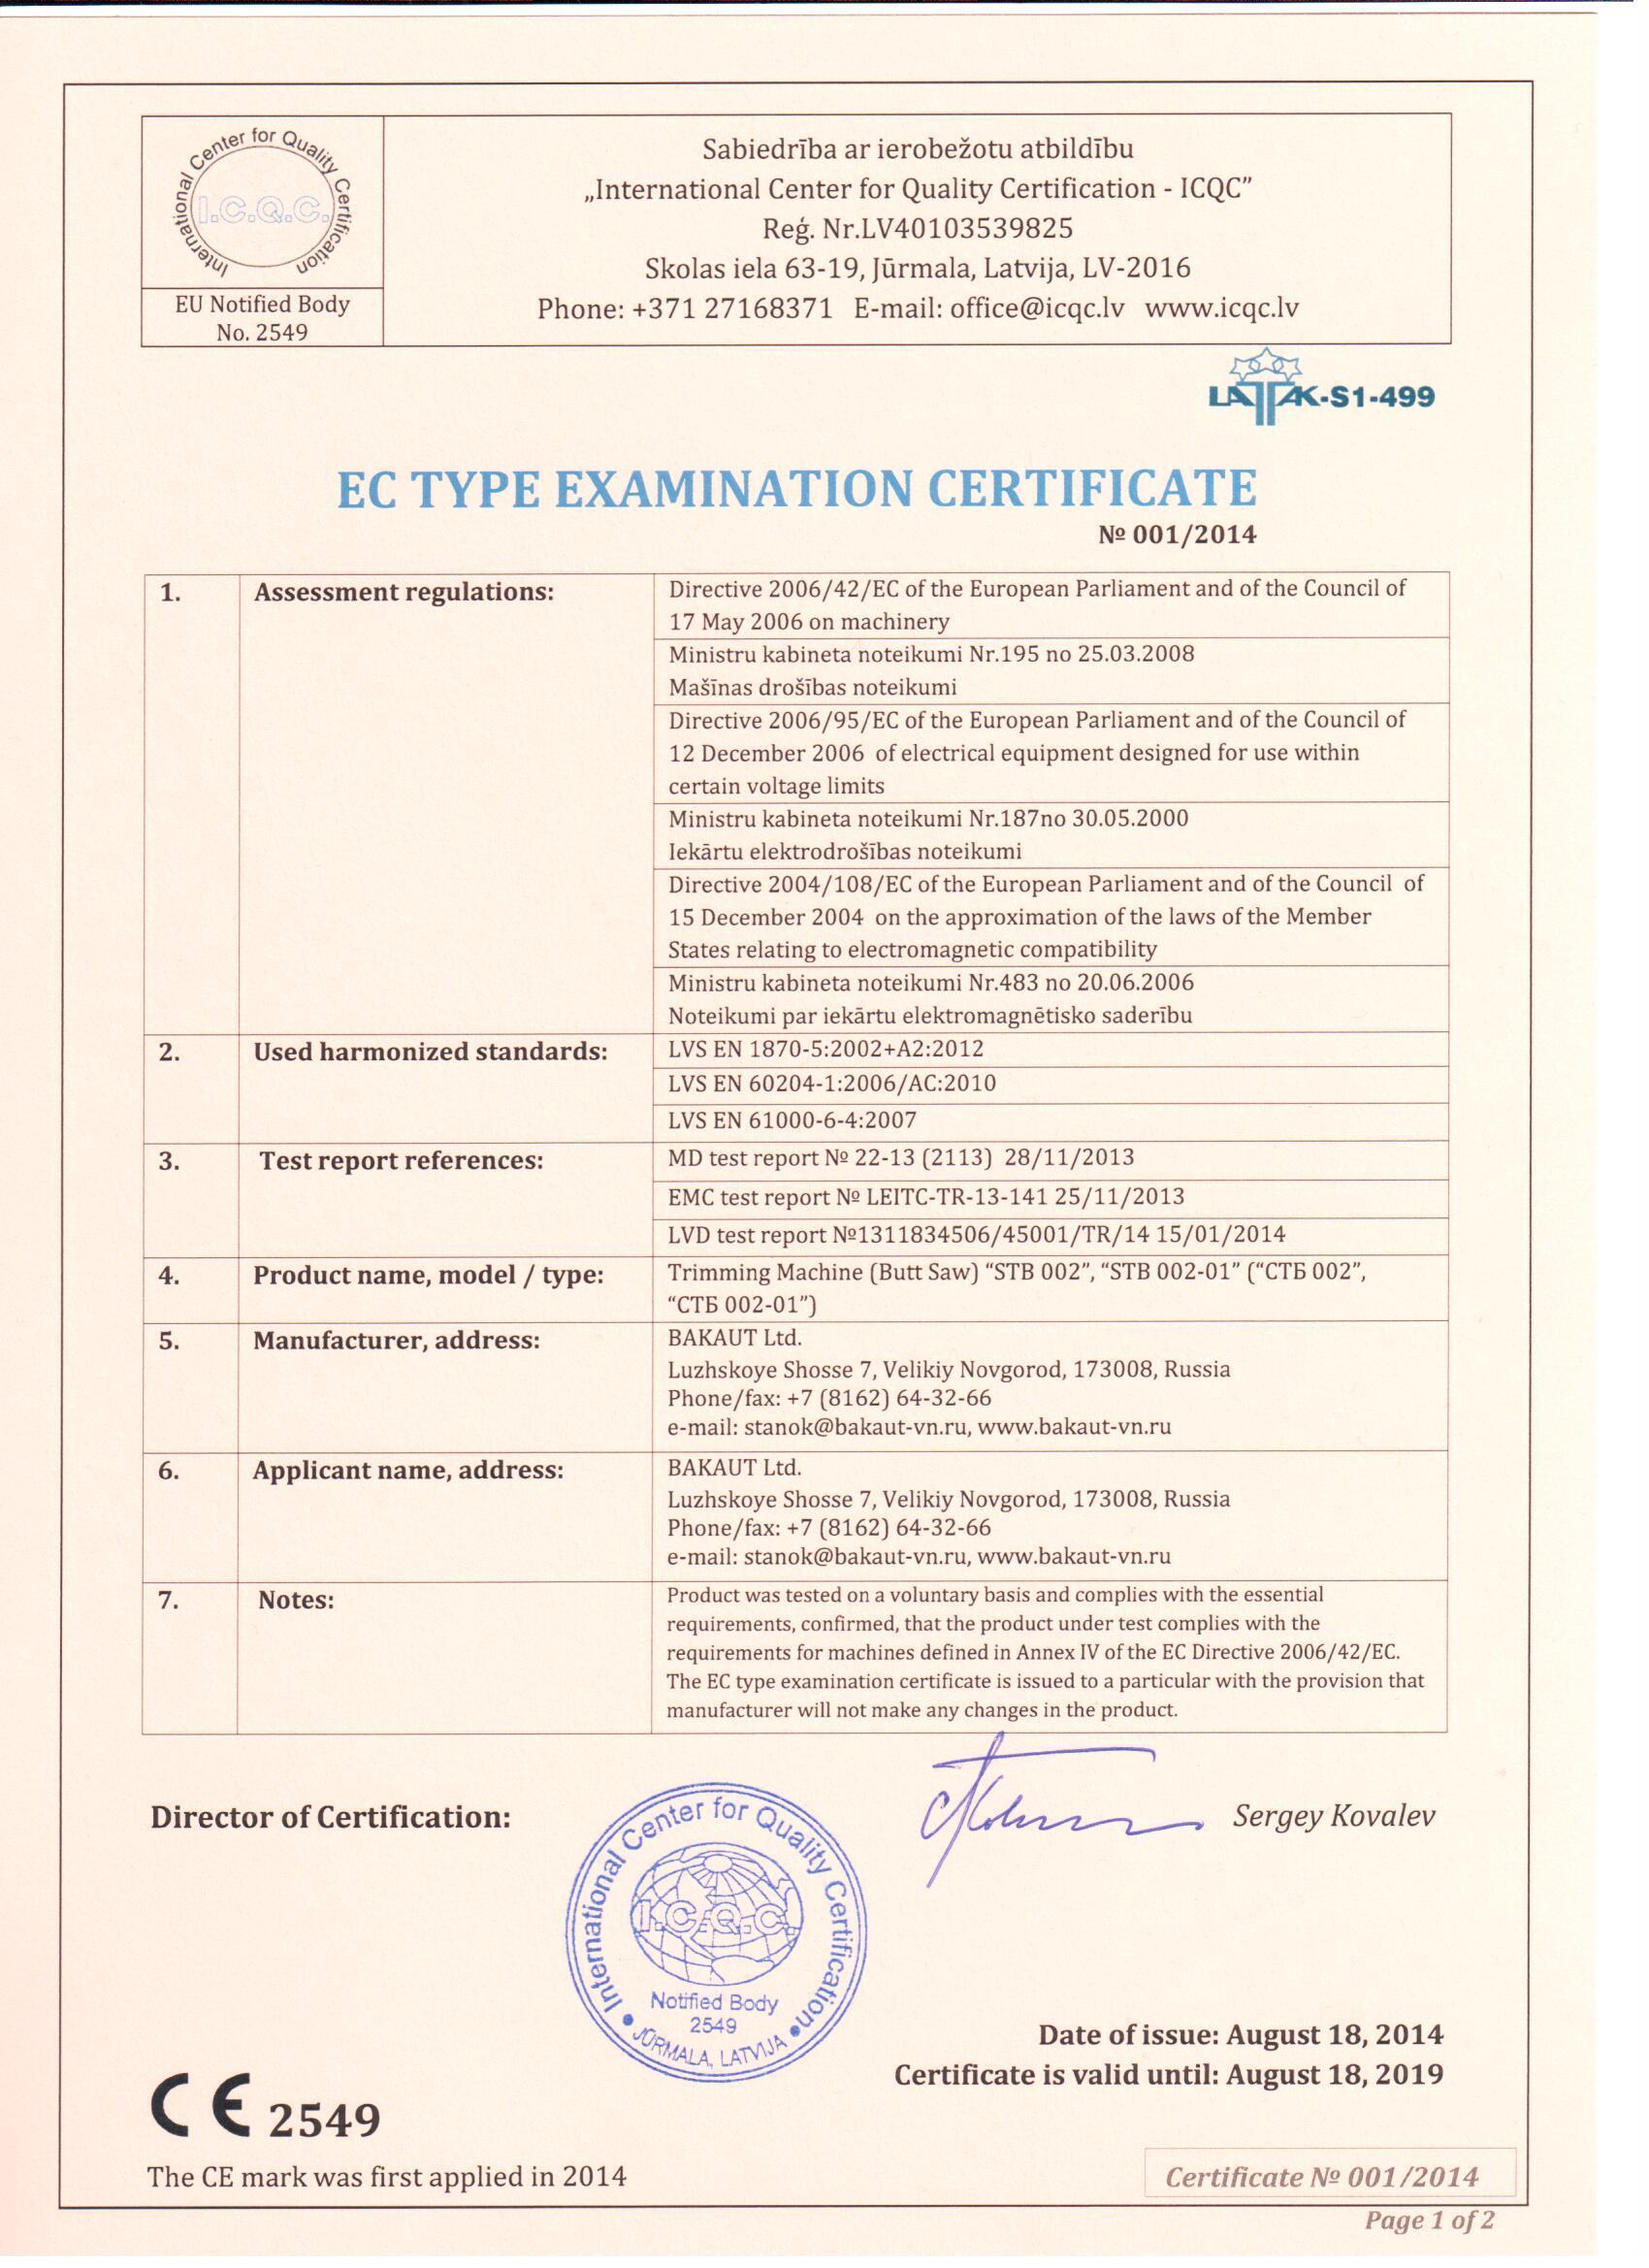 EC Type Examination Certificate ЕС Сертификат испытания типа